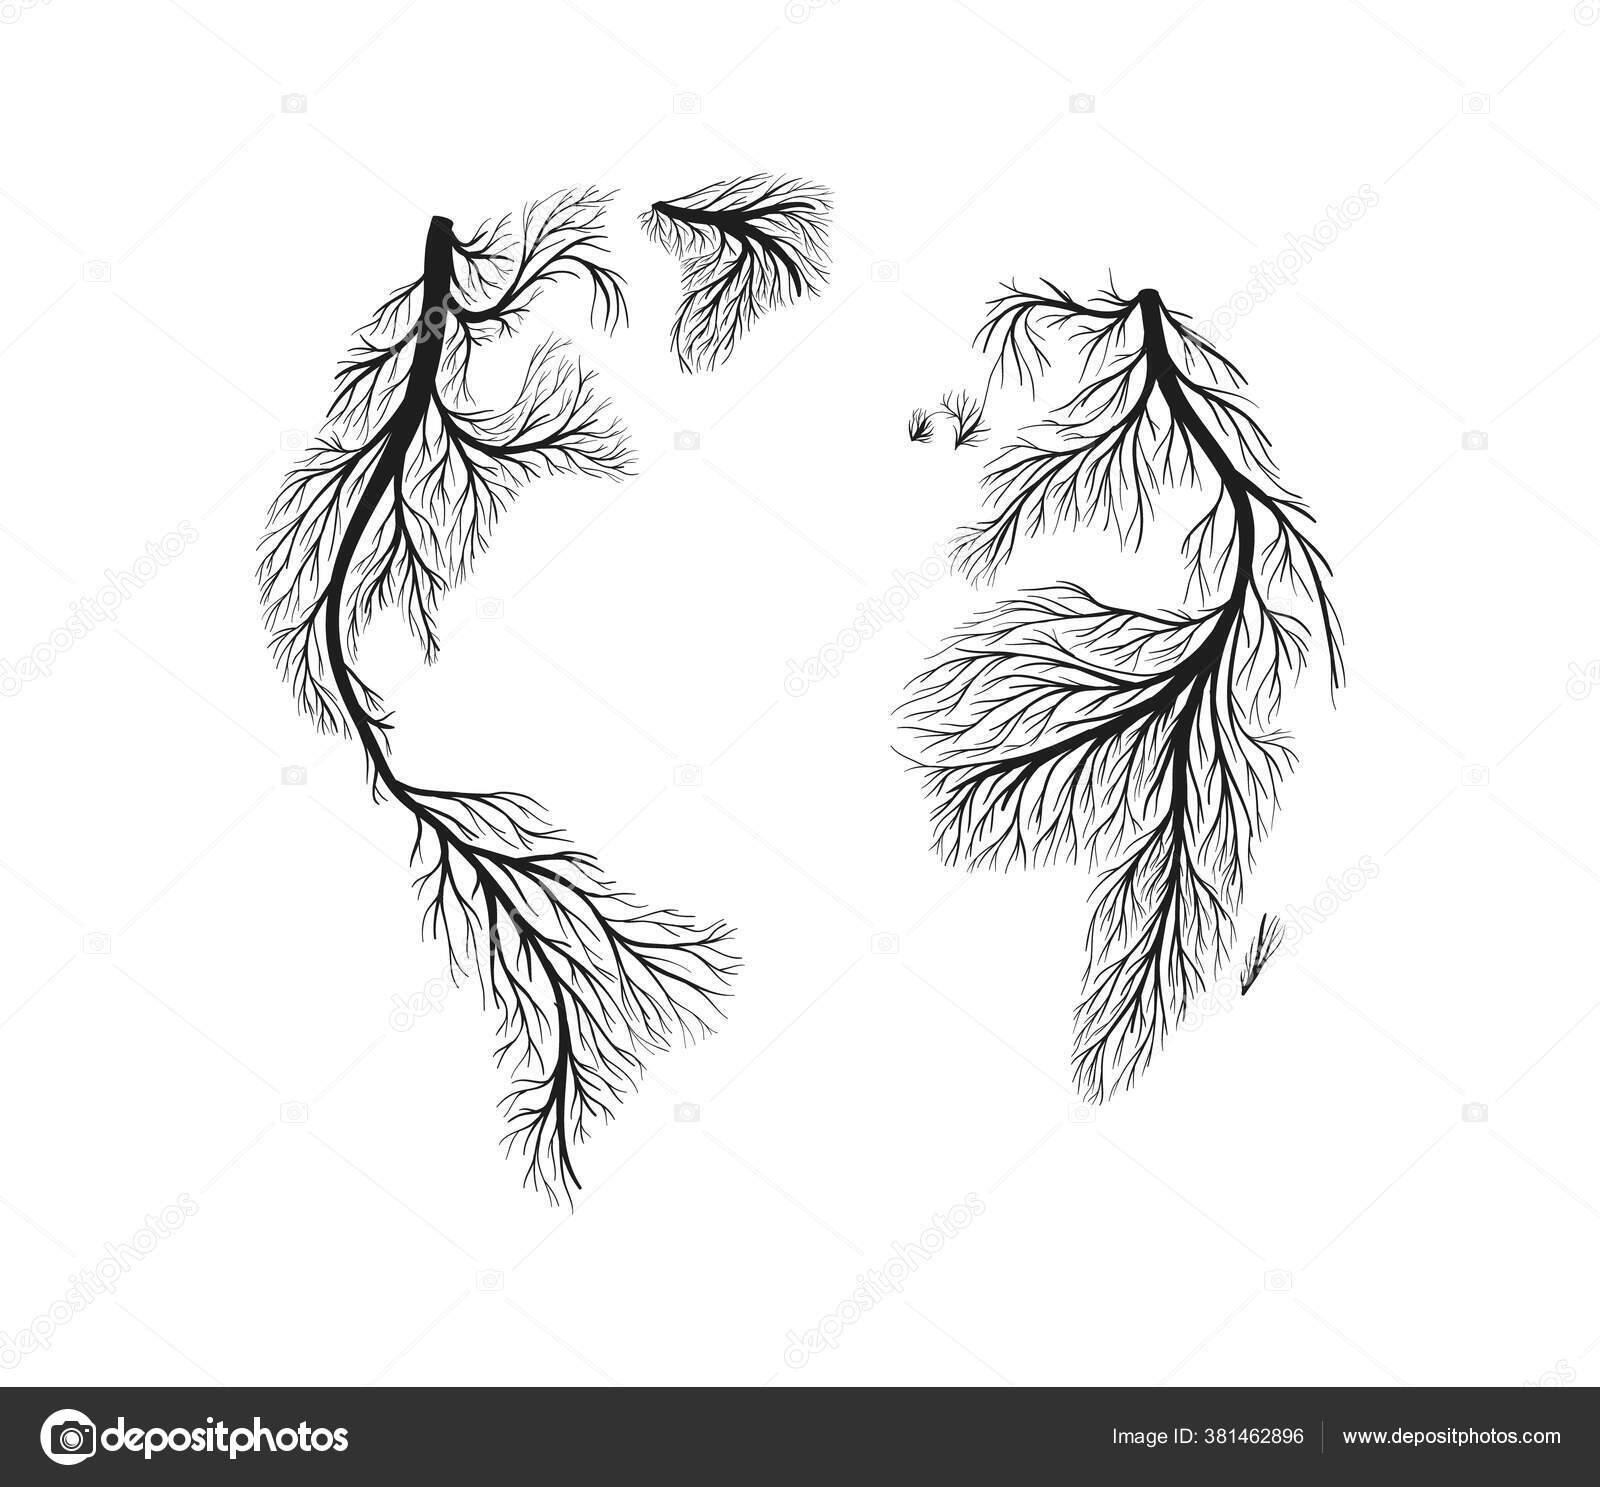 Peta Dunia Yang Terbuat Dari Akar Pohon Gambar Tangan Pada Stok Vektor C Cienpies 381462896